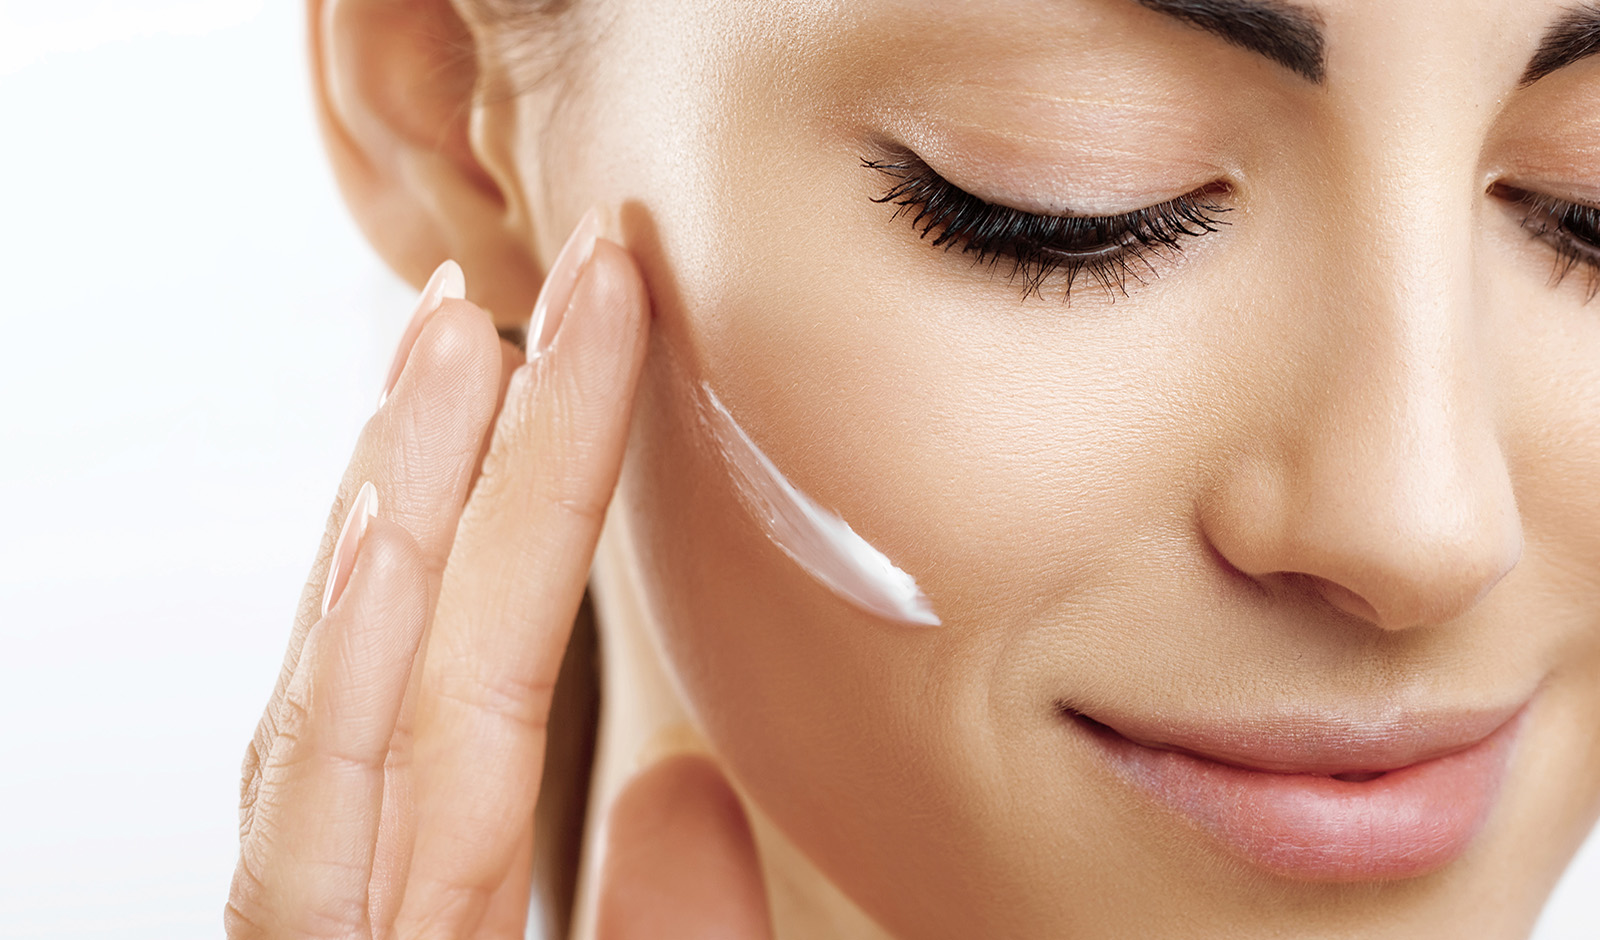 diy-natural-makeup-removers-woman-applying-cream-on-face